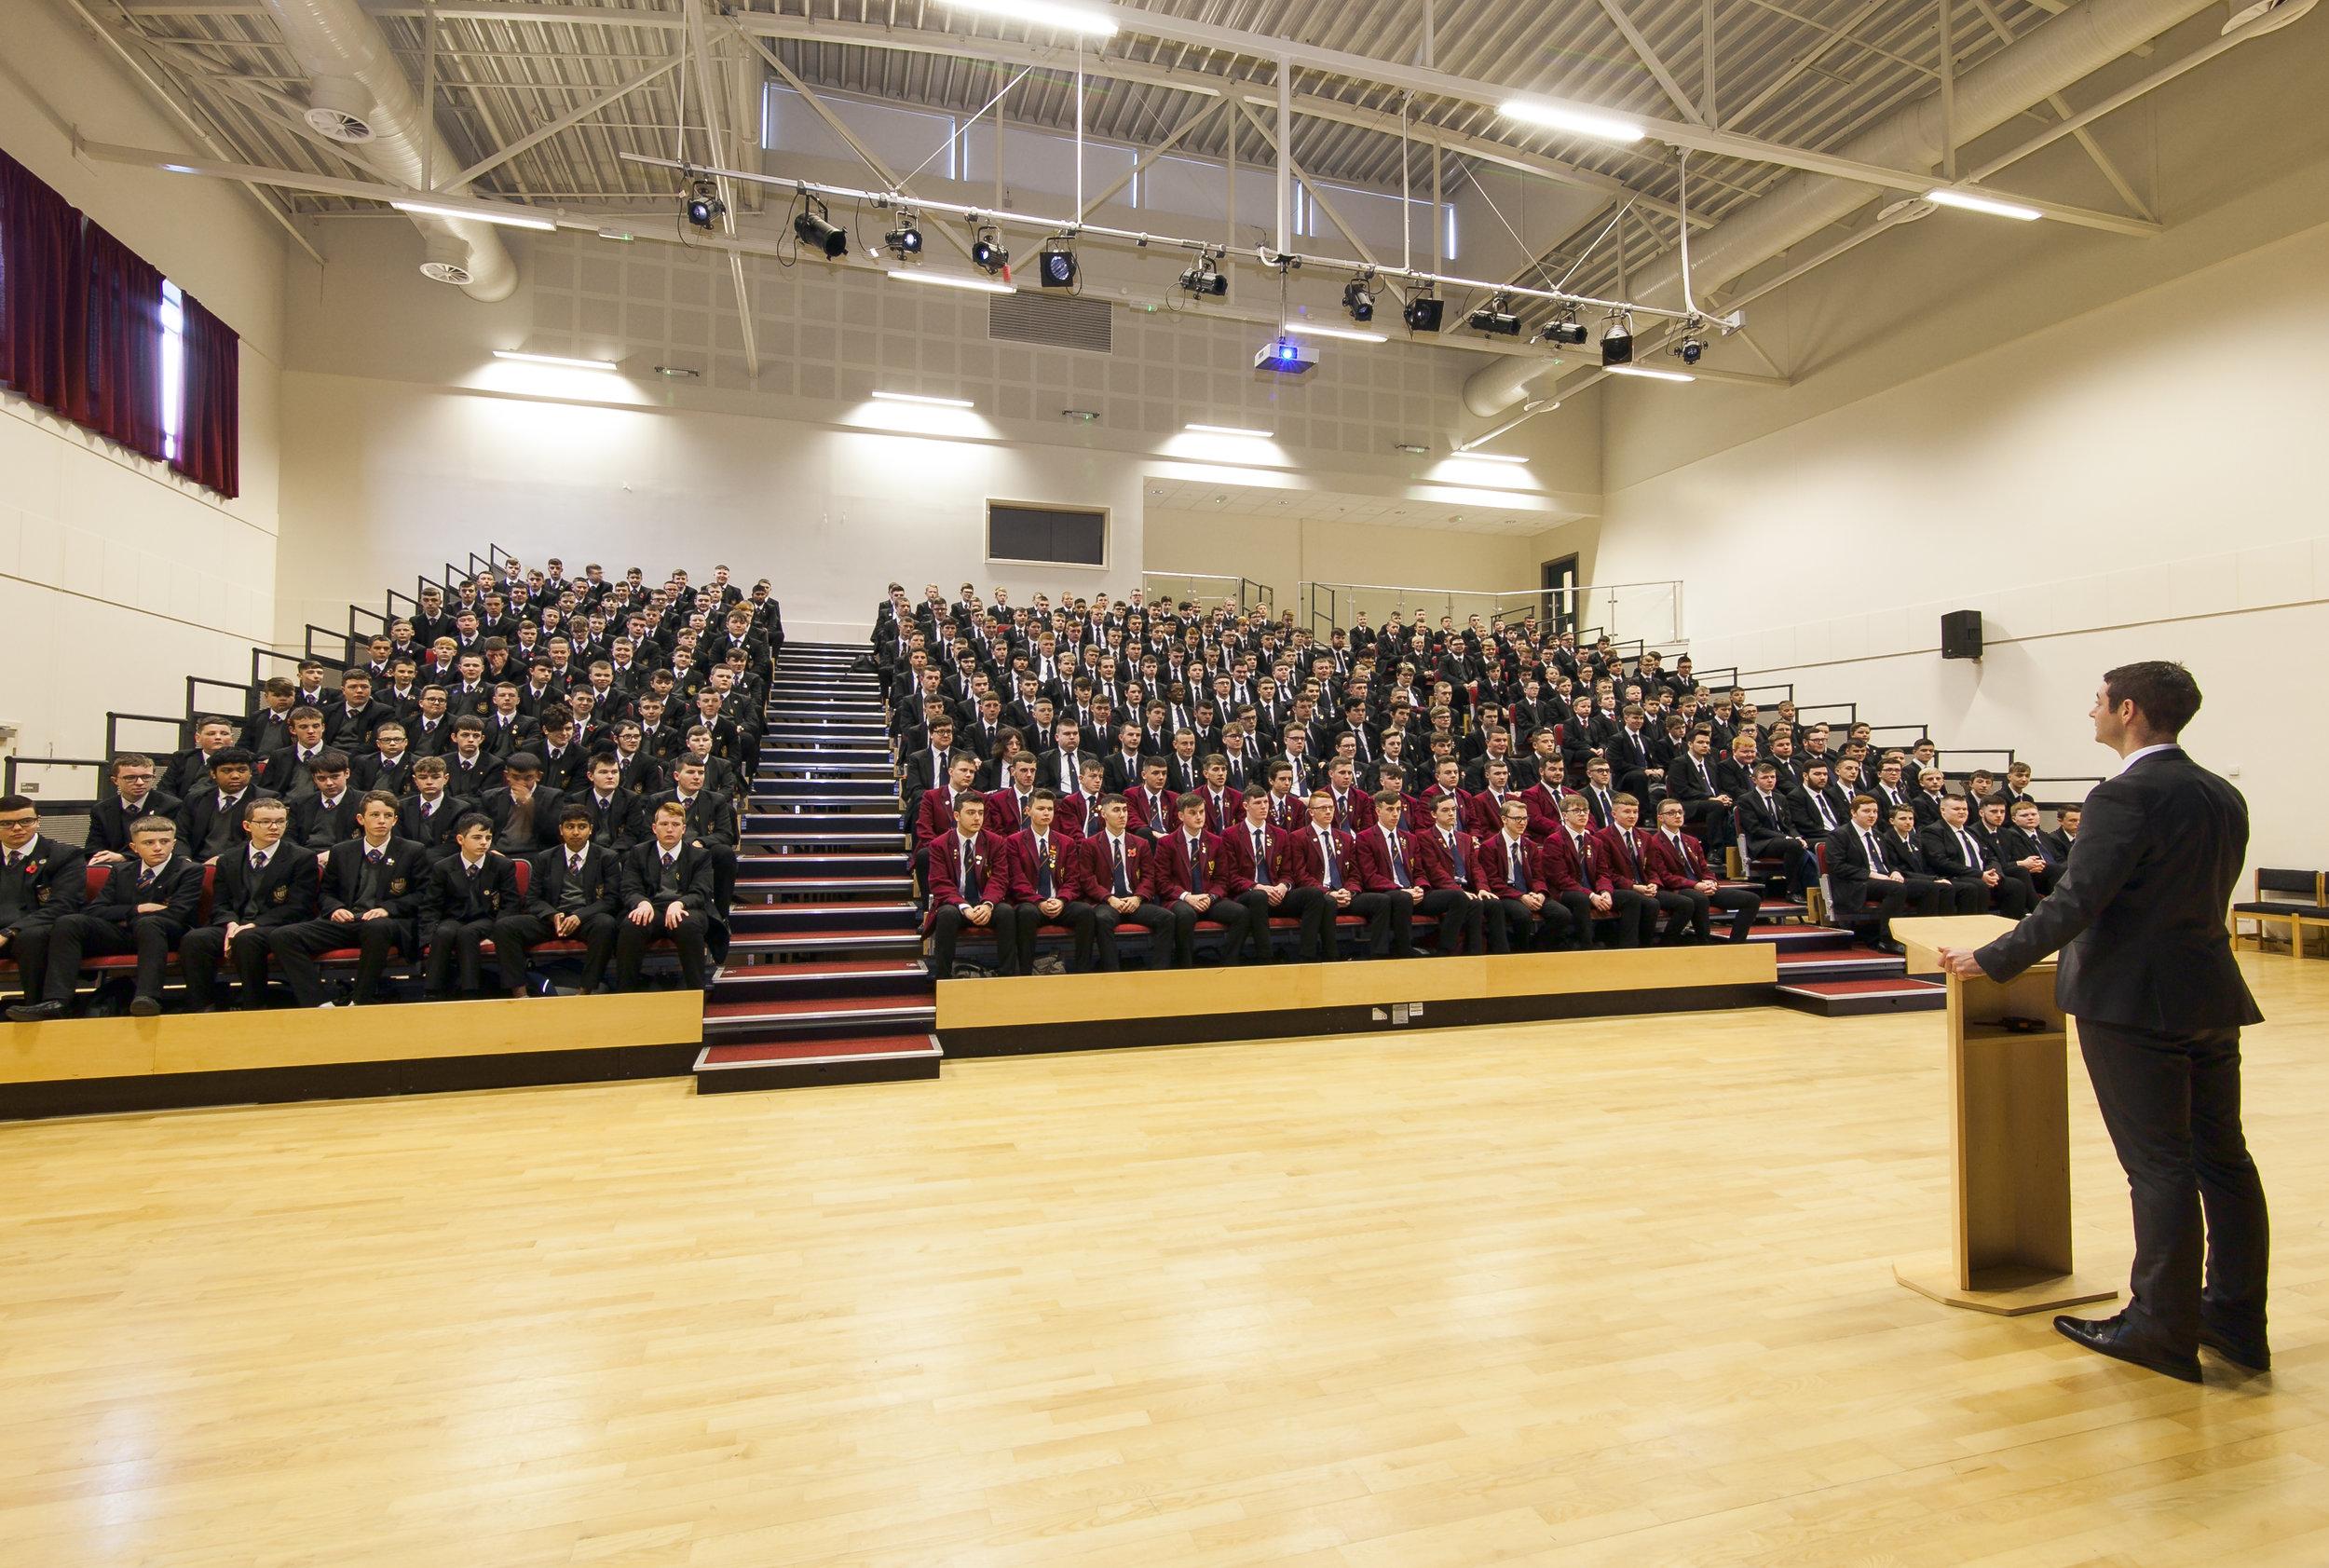 Belfast Boys' Model School Facilities - Auditorium